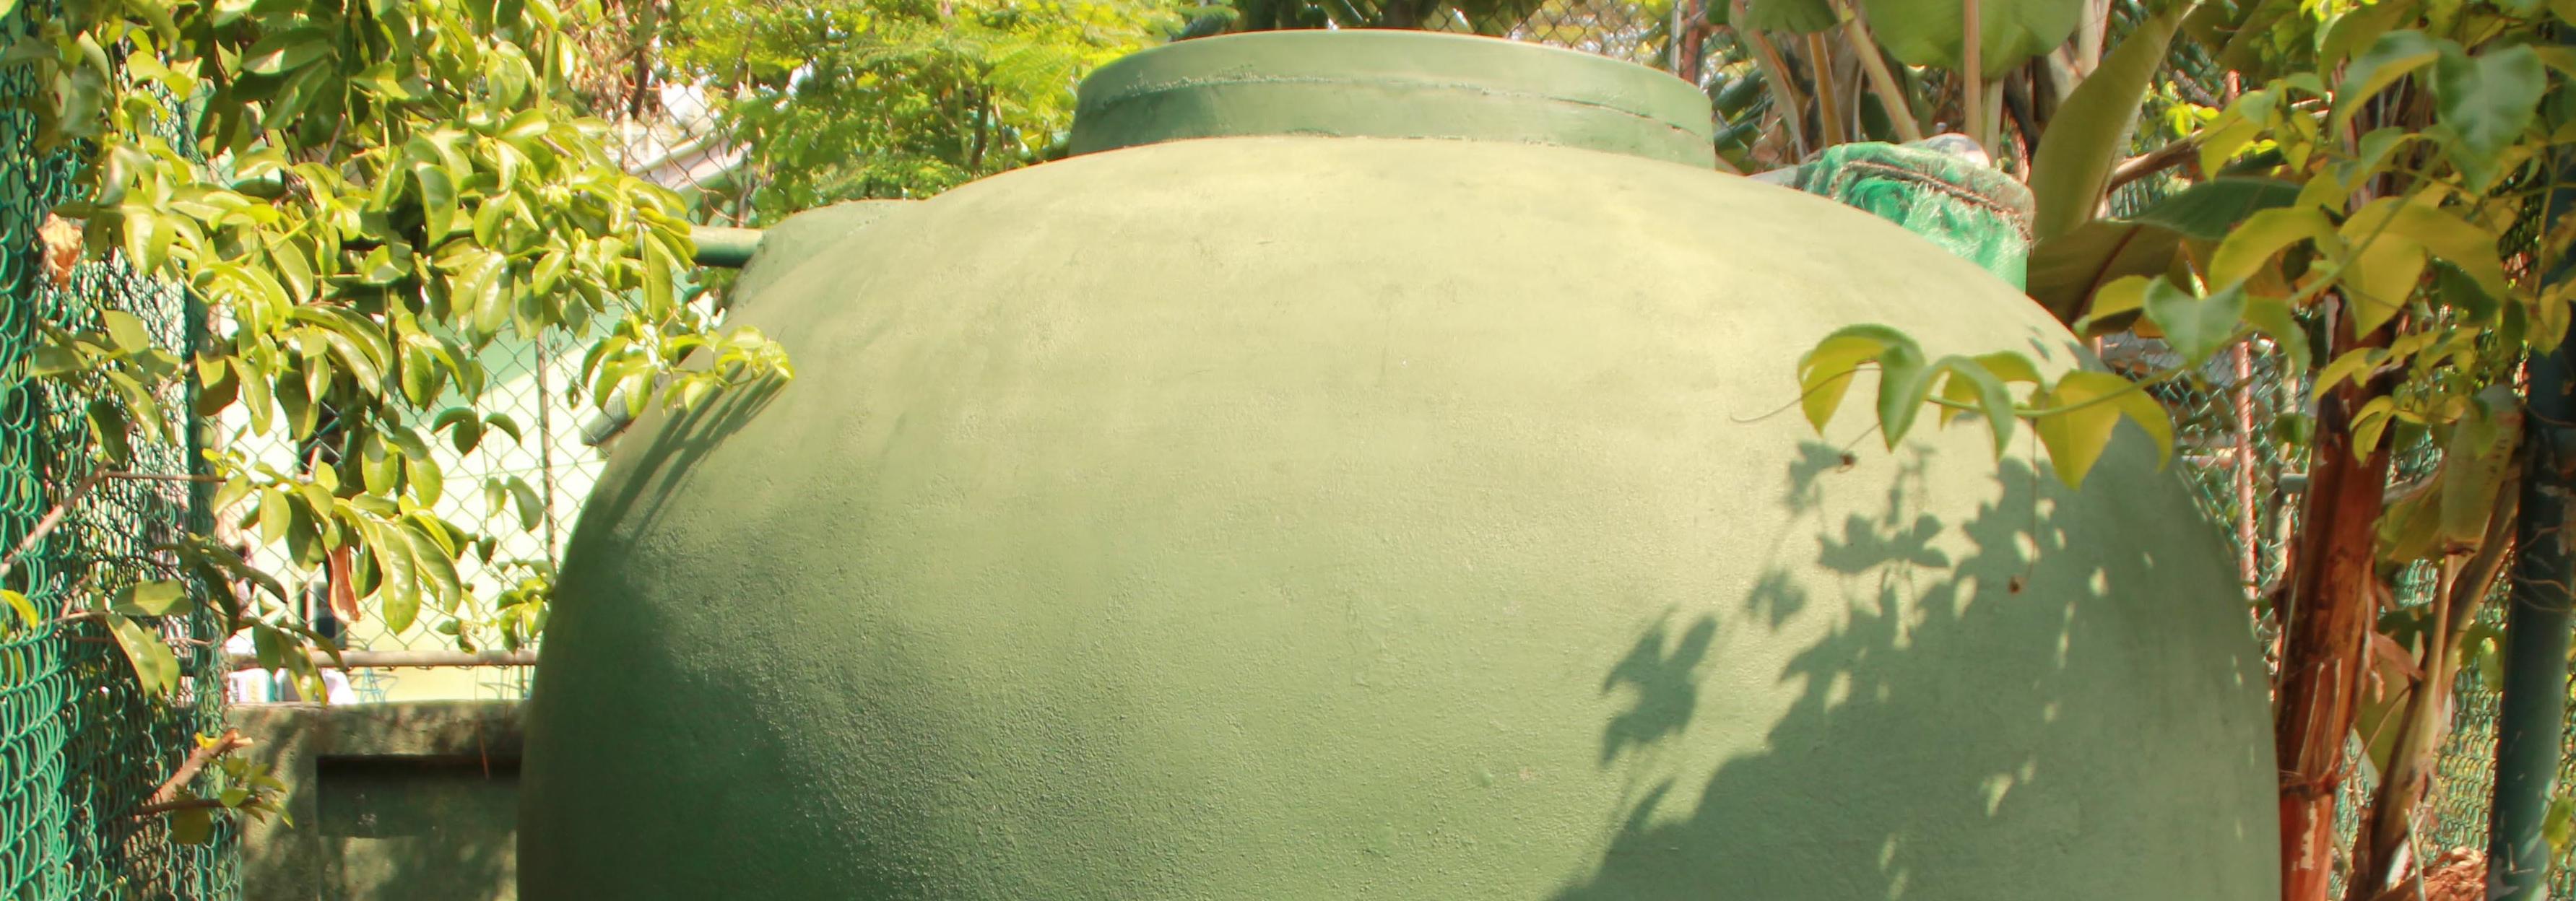 rain water harvest1